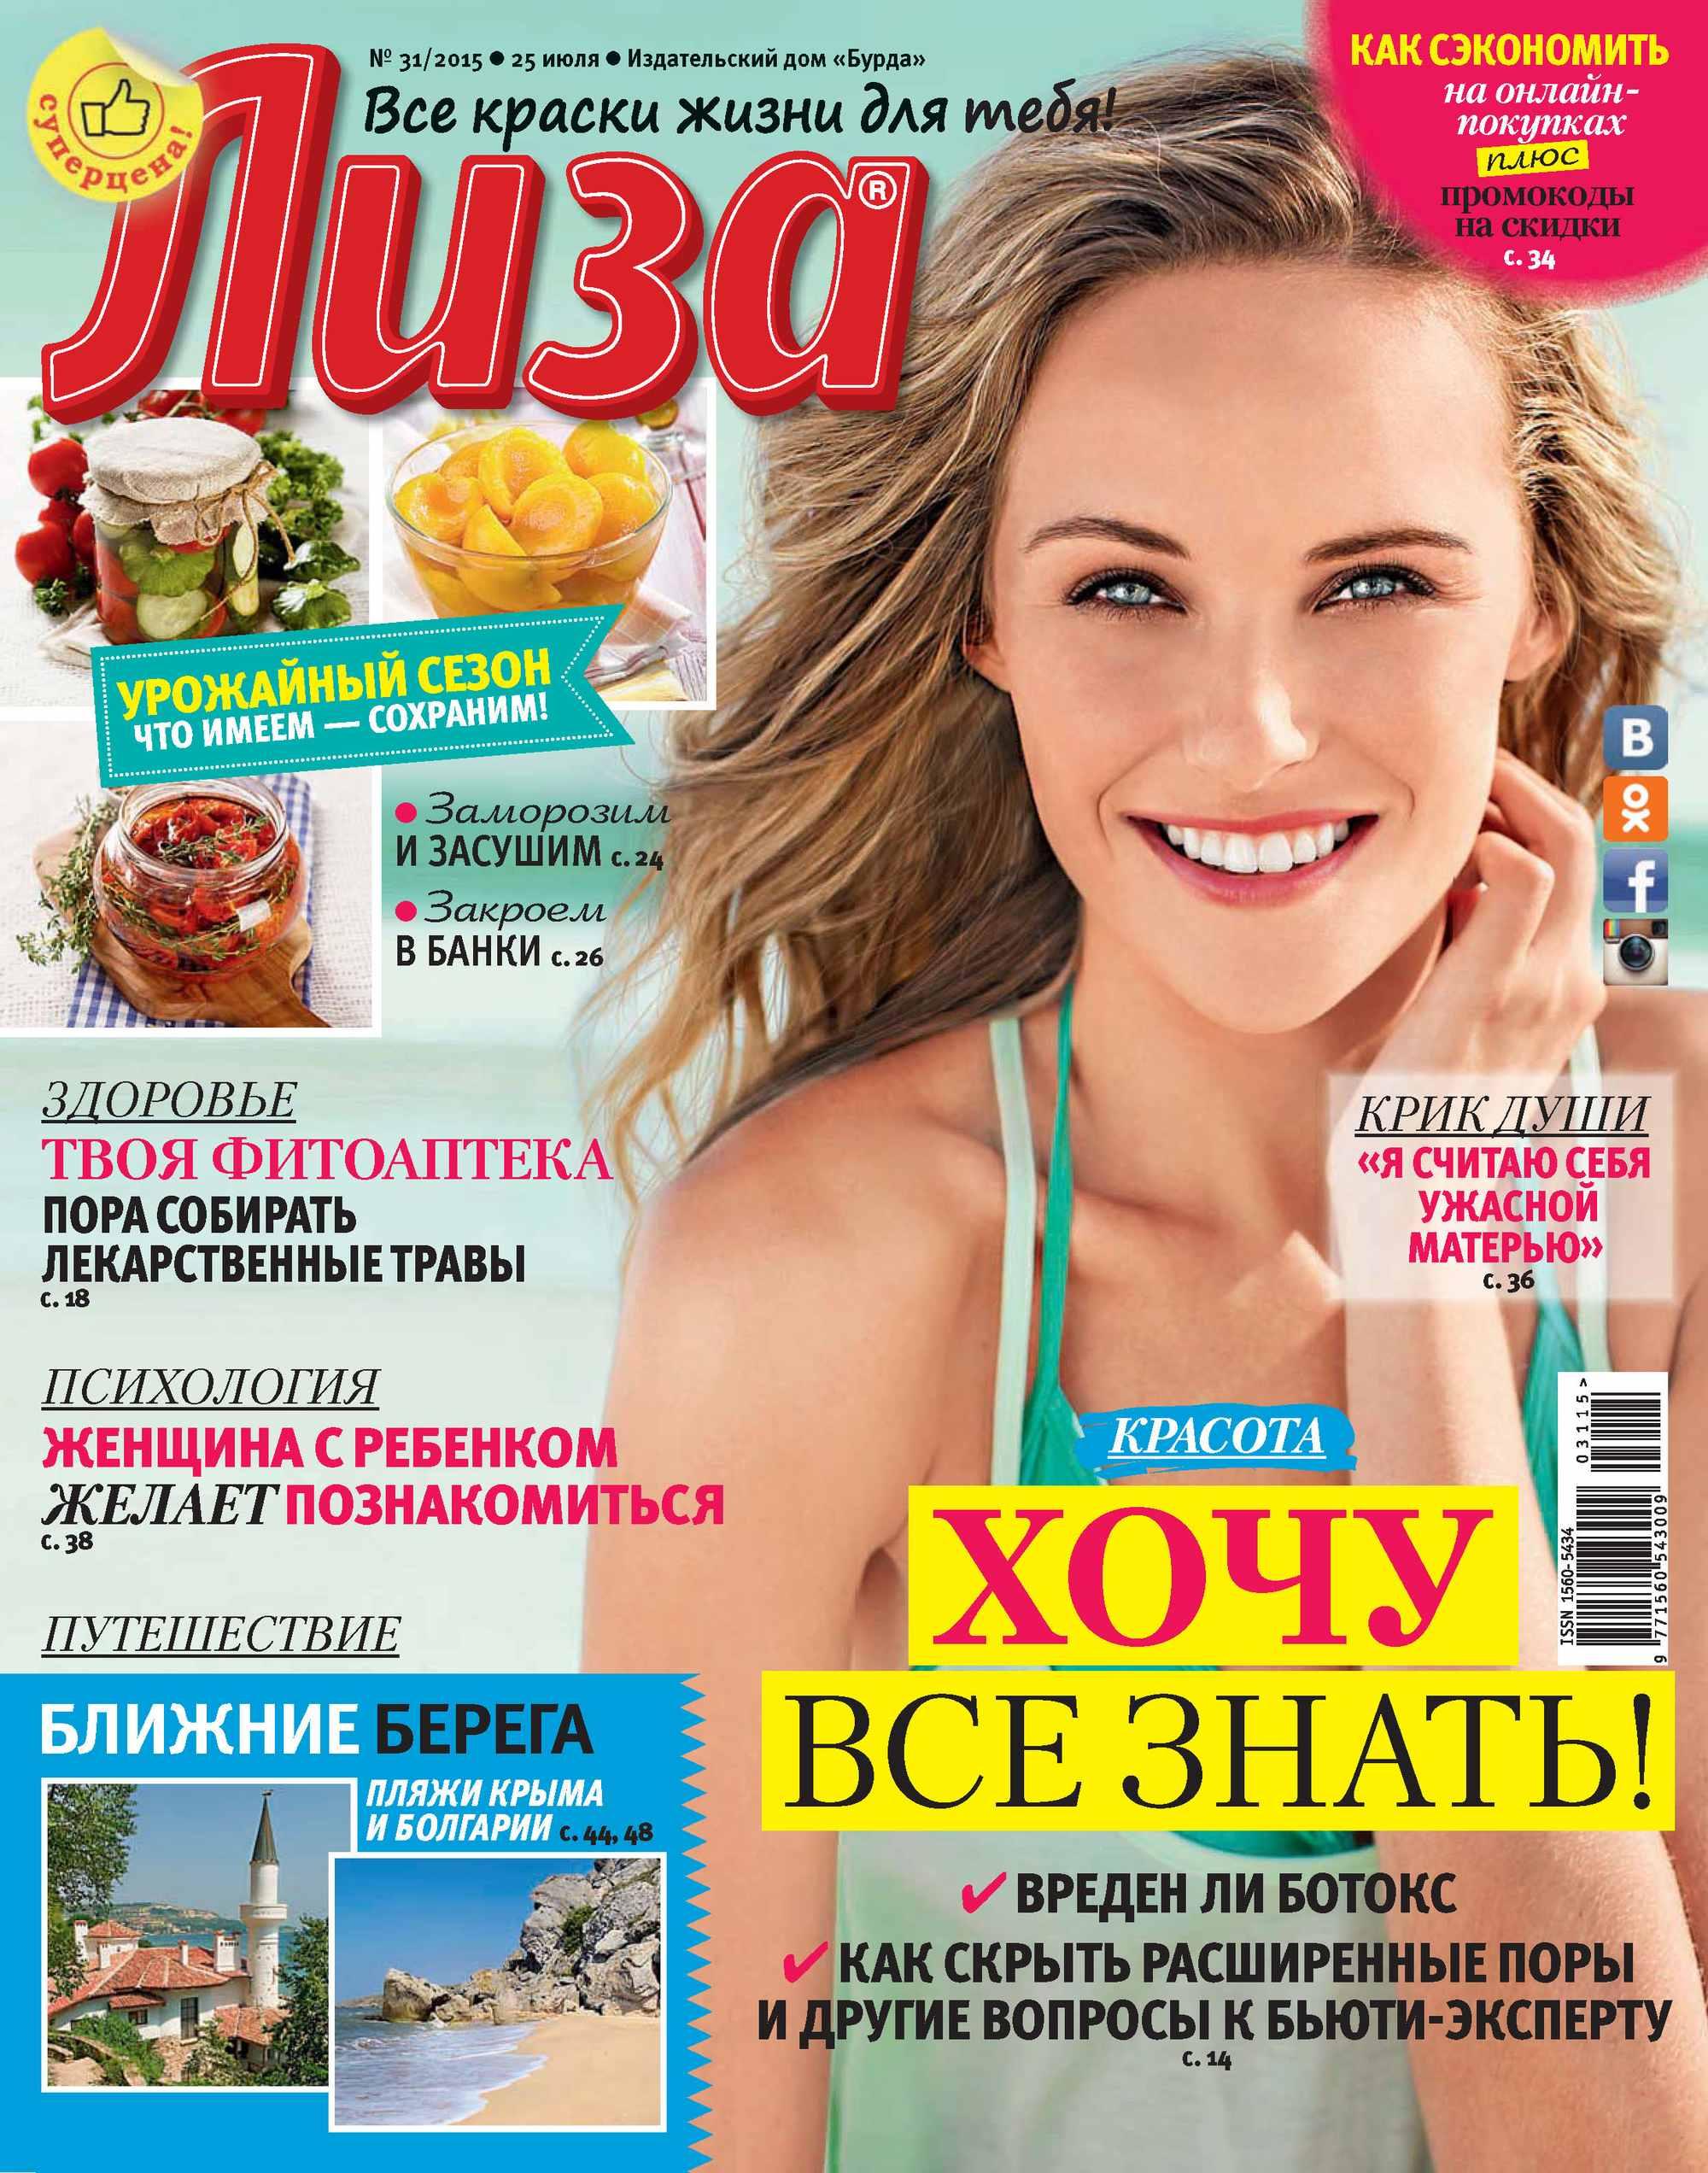 ИД «Бурда» Журнал «Лиза» №31/2015 ид бурда журнал лиза 08 2015